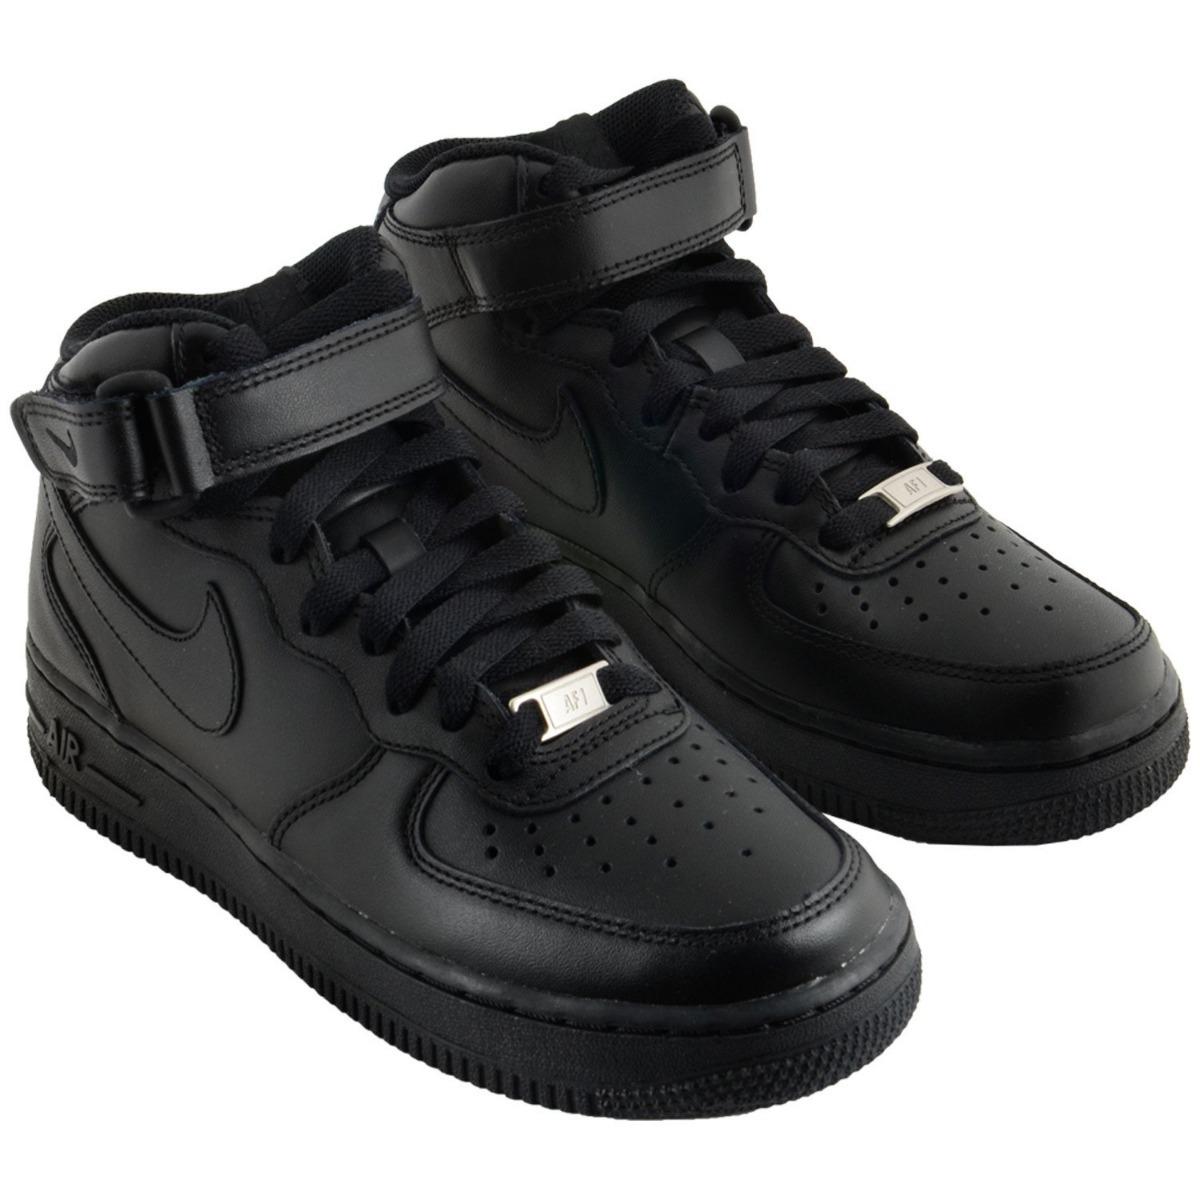 Tênis Nike Air Force 1 Mid Feminino Botinha Preto Botinha Feminino Original  R 385 ... 1dcbc5